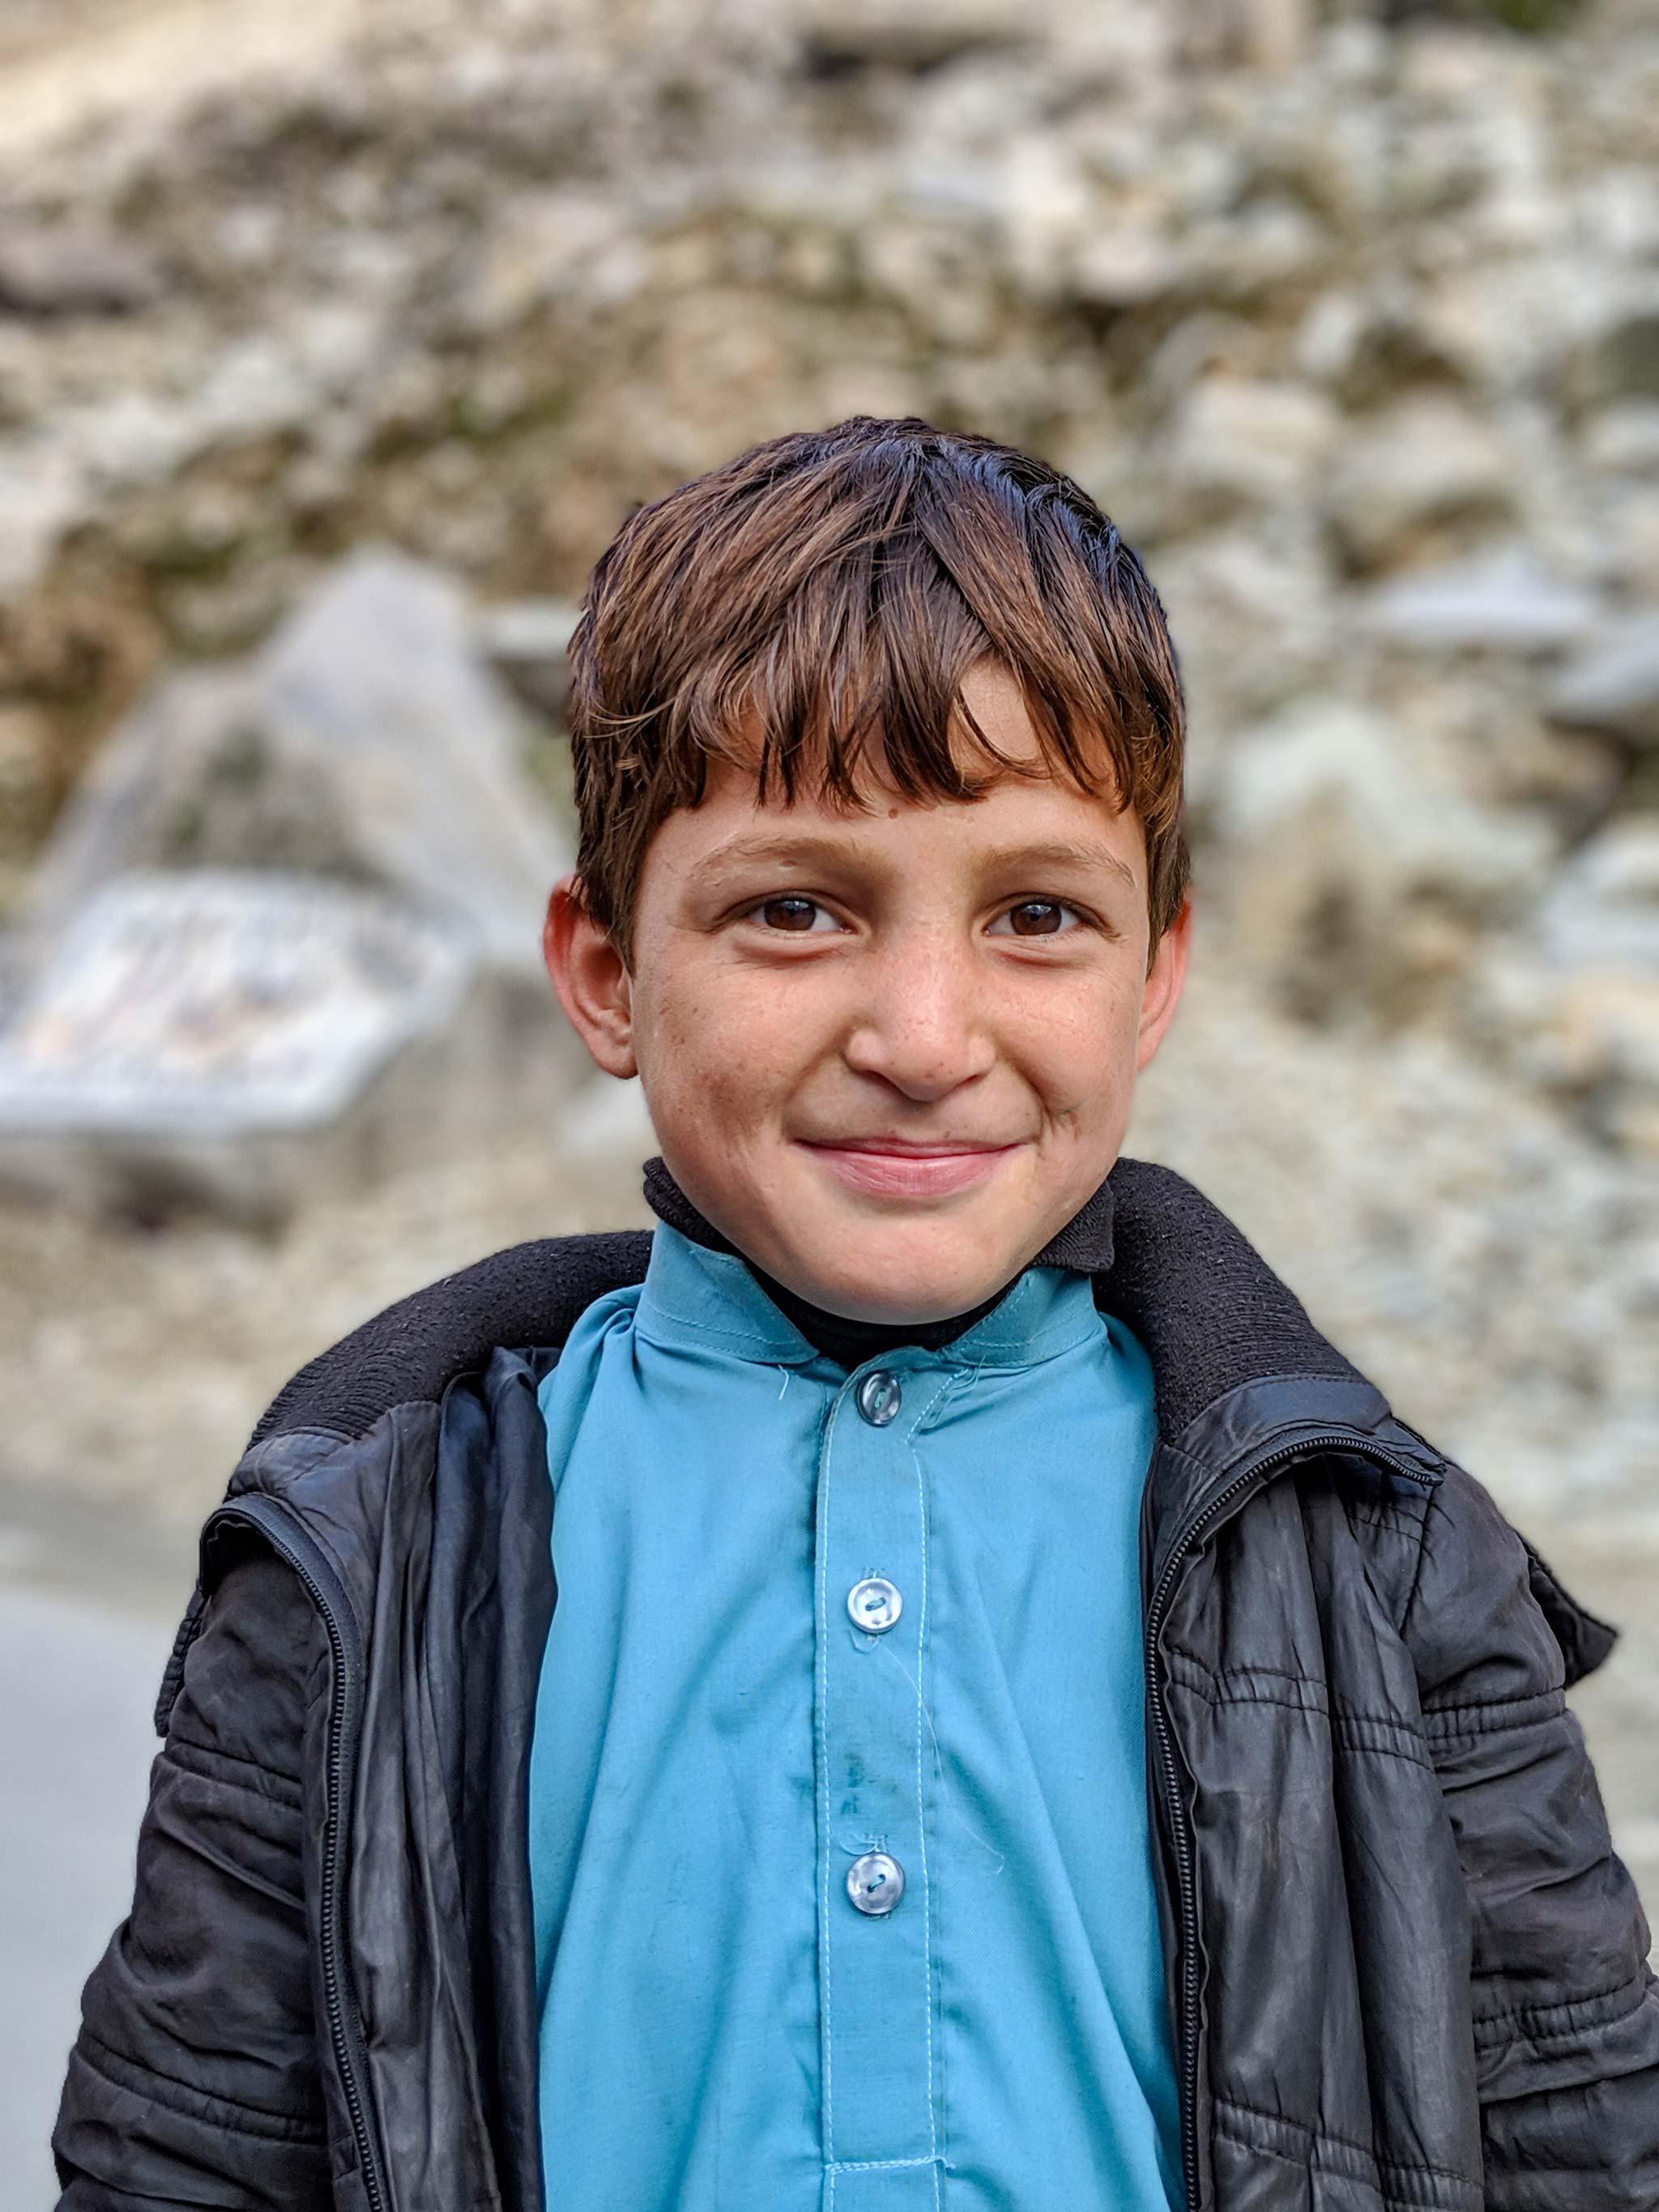 Pakistan's-Eyes-60.jpg